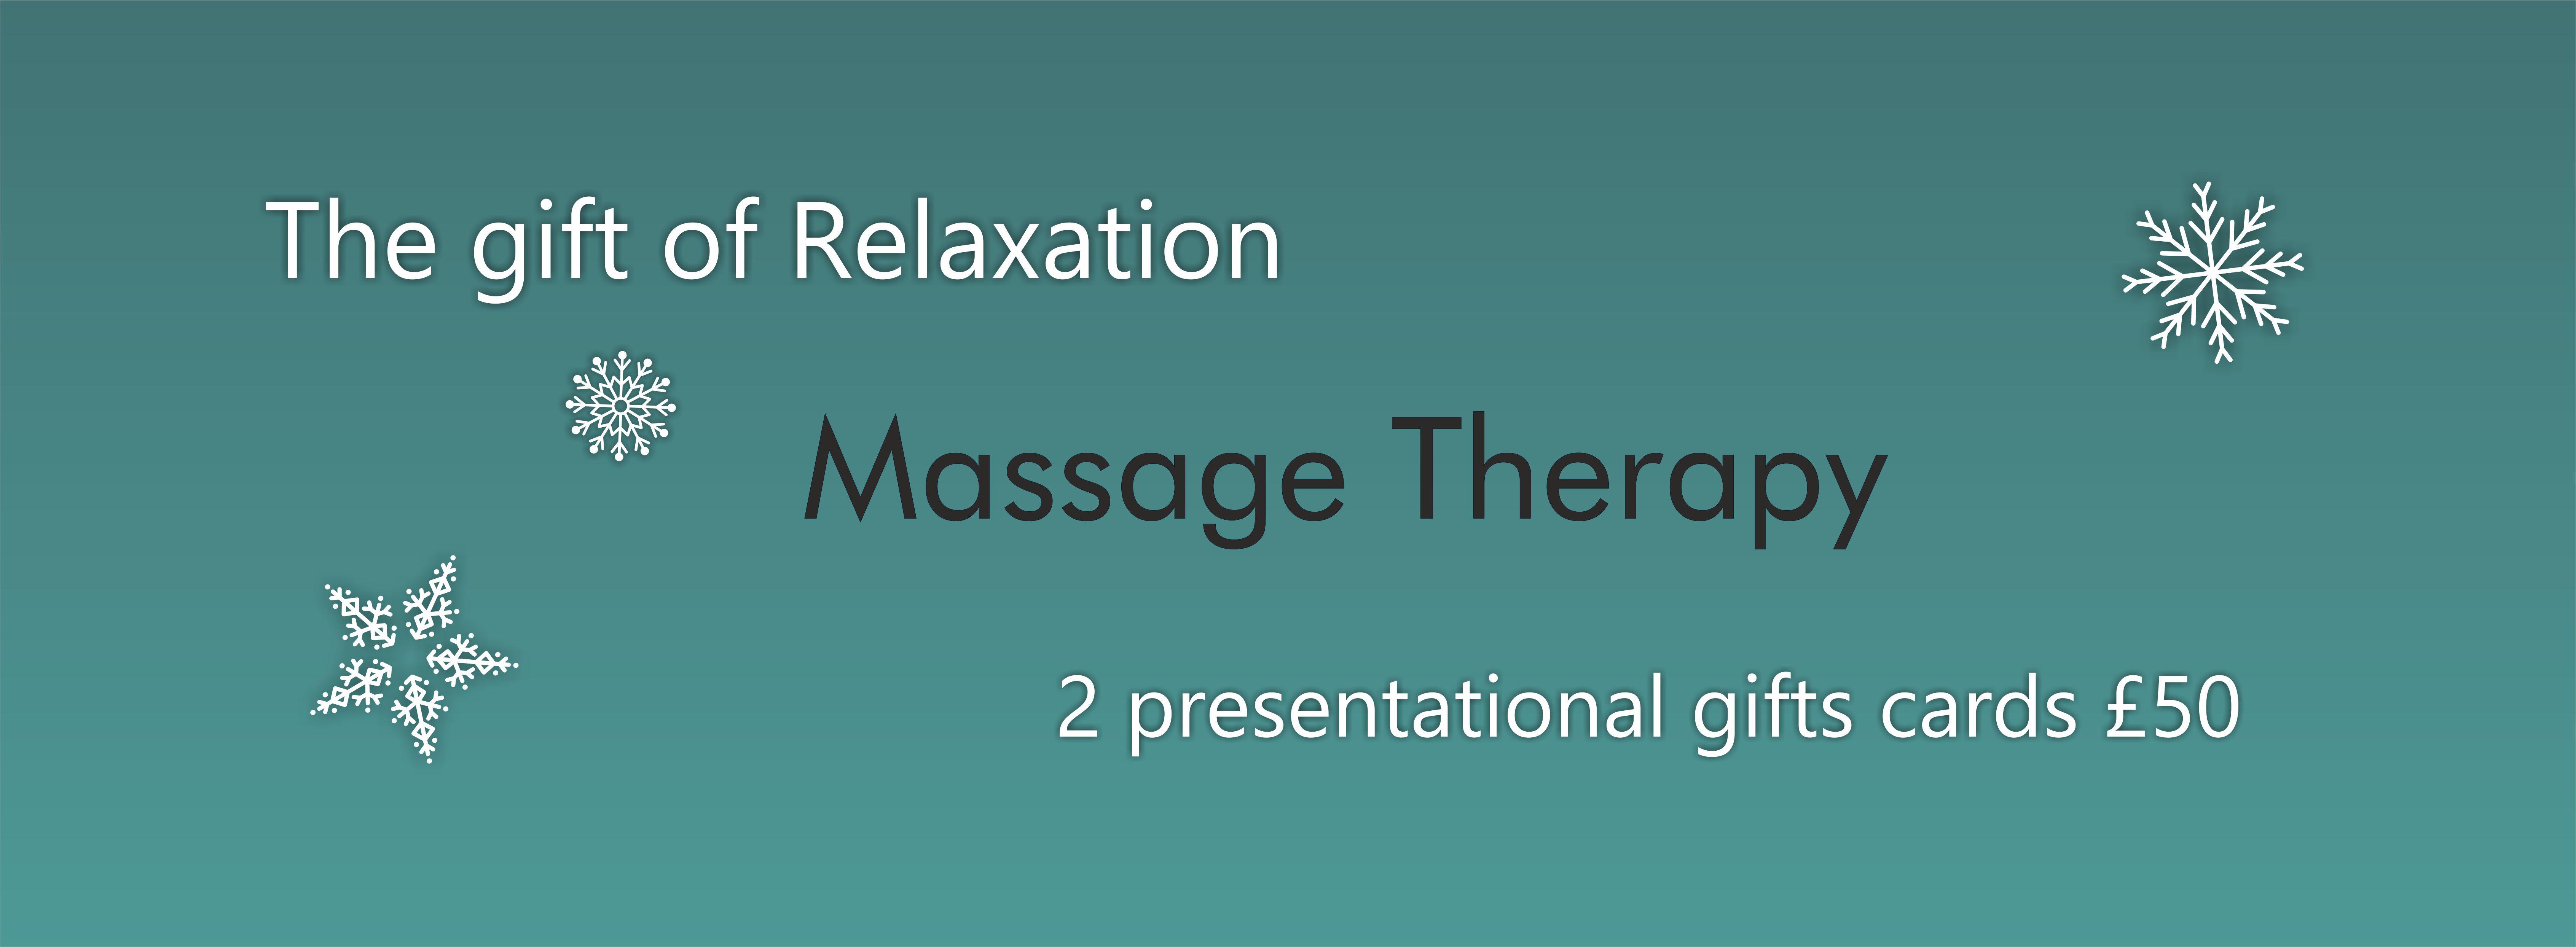 christmass-massage-advert-fb